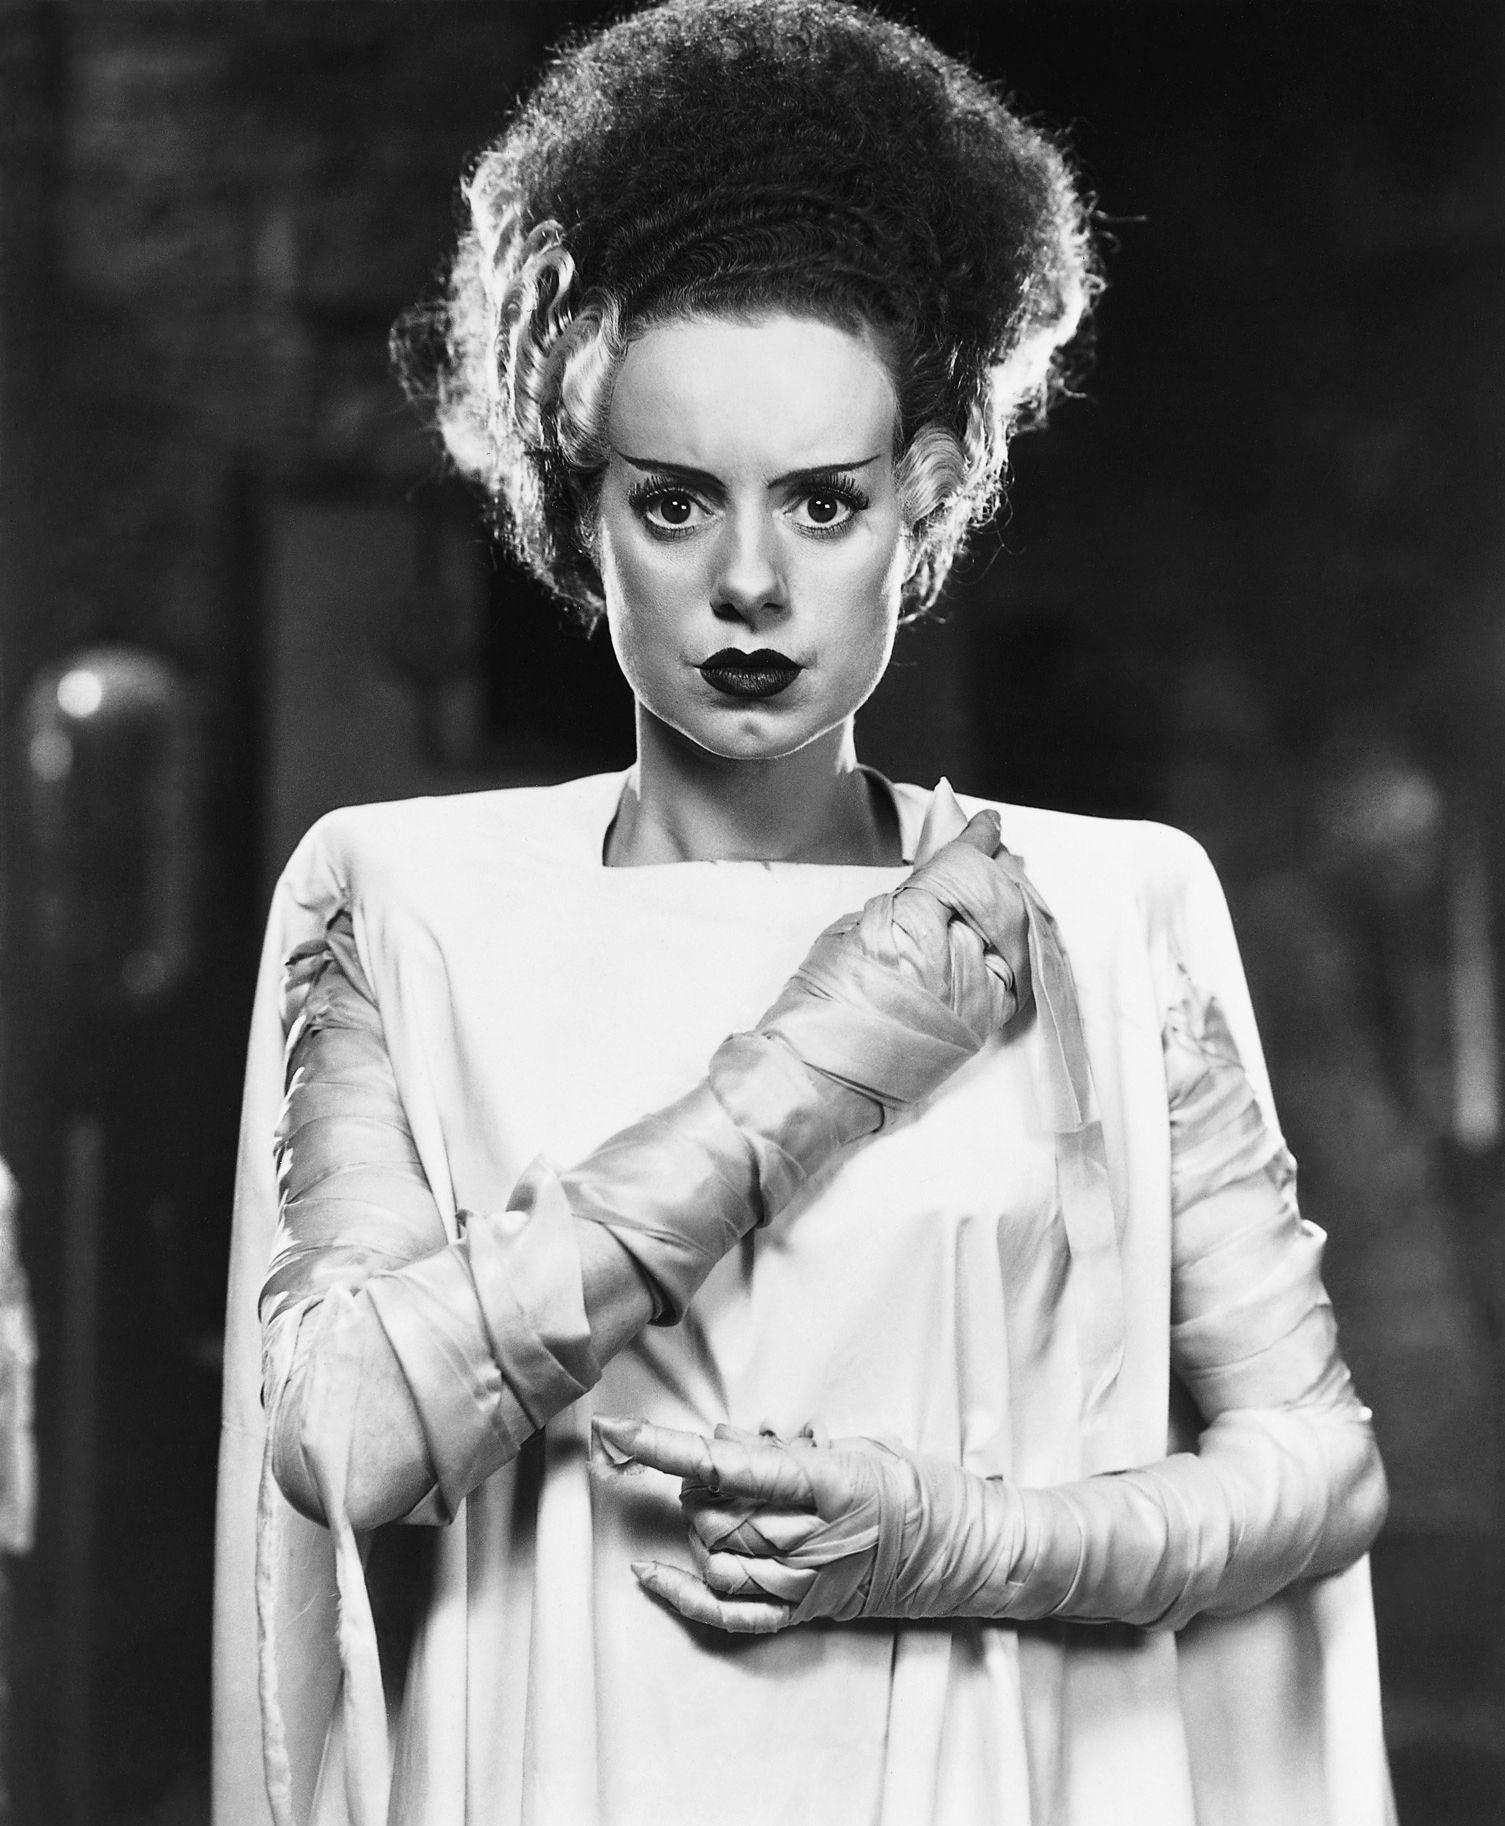 However Bride Of Frankenstein